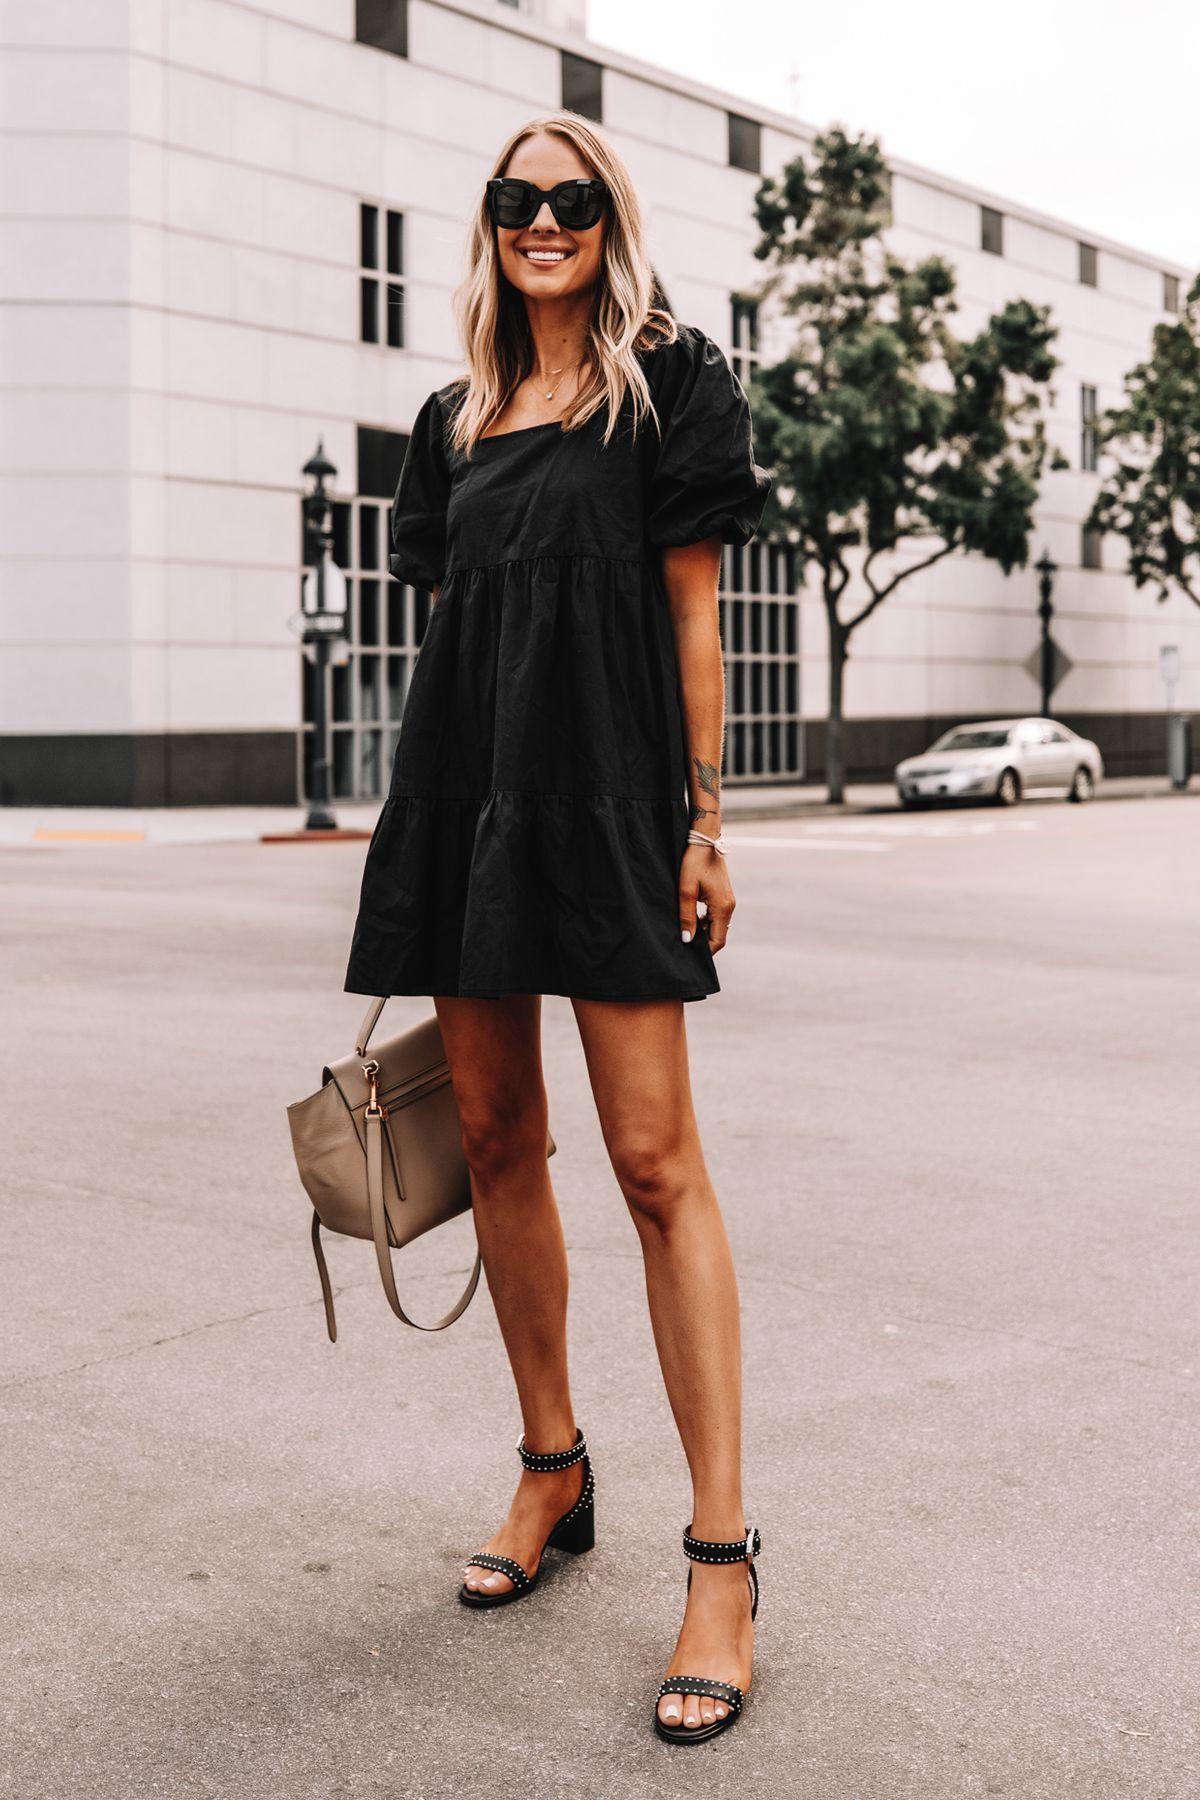 Summer Sandal And Flip Flop Round Up Fashion Jackson Fashion Jackson Summer Black Dress Outfit Short Black Summer Dresses [ 1800 x 1200 Pixel ]